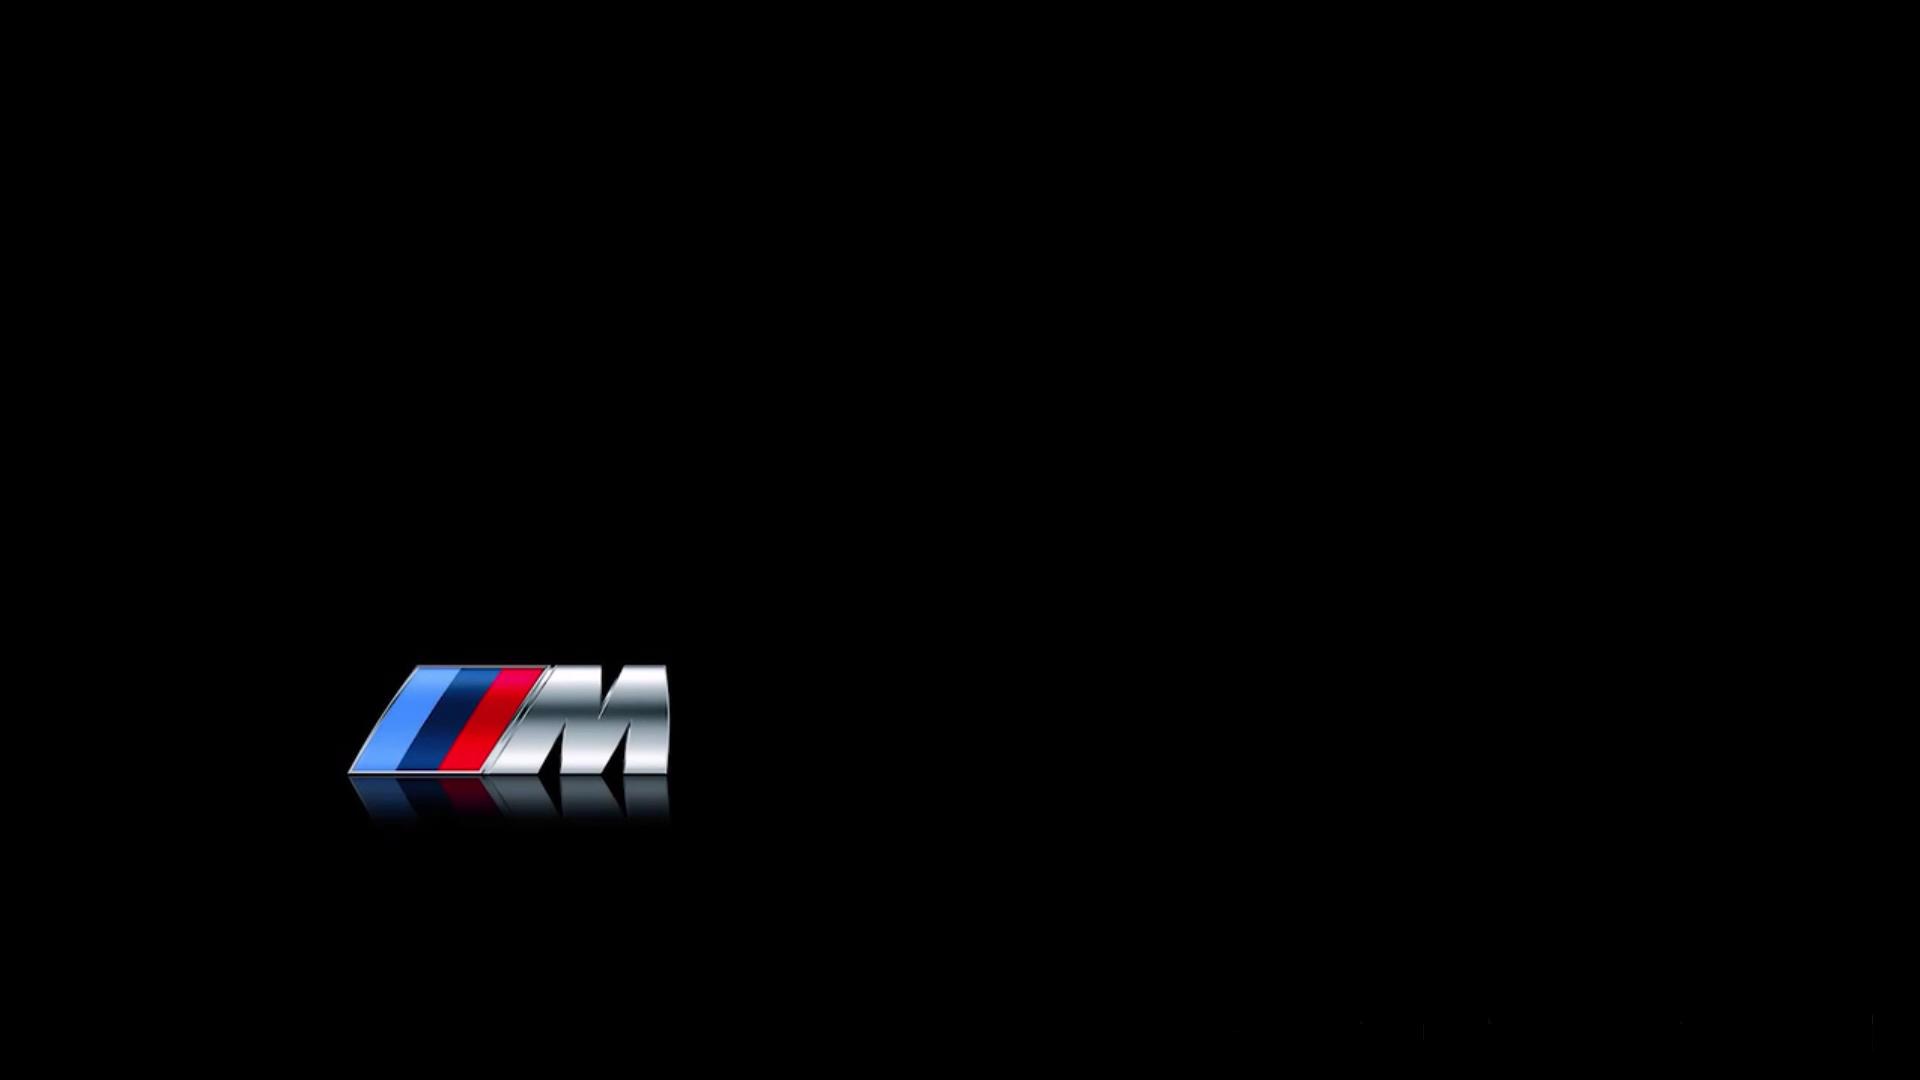 Bmw M Logo Wallpapers 1920x1080